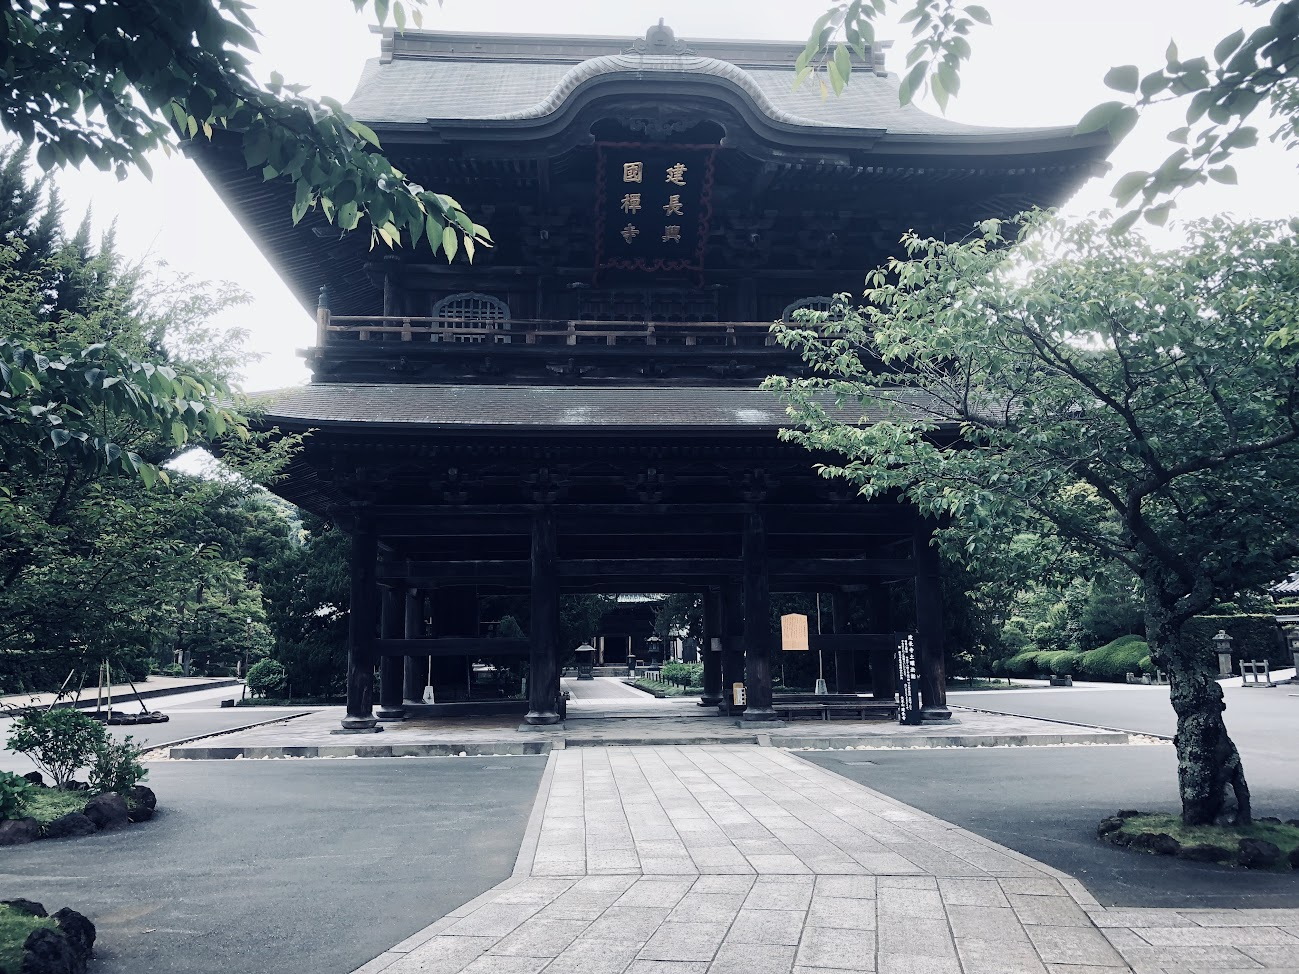 Gate of Kenchoji temple